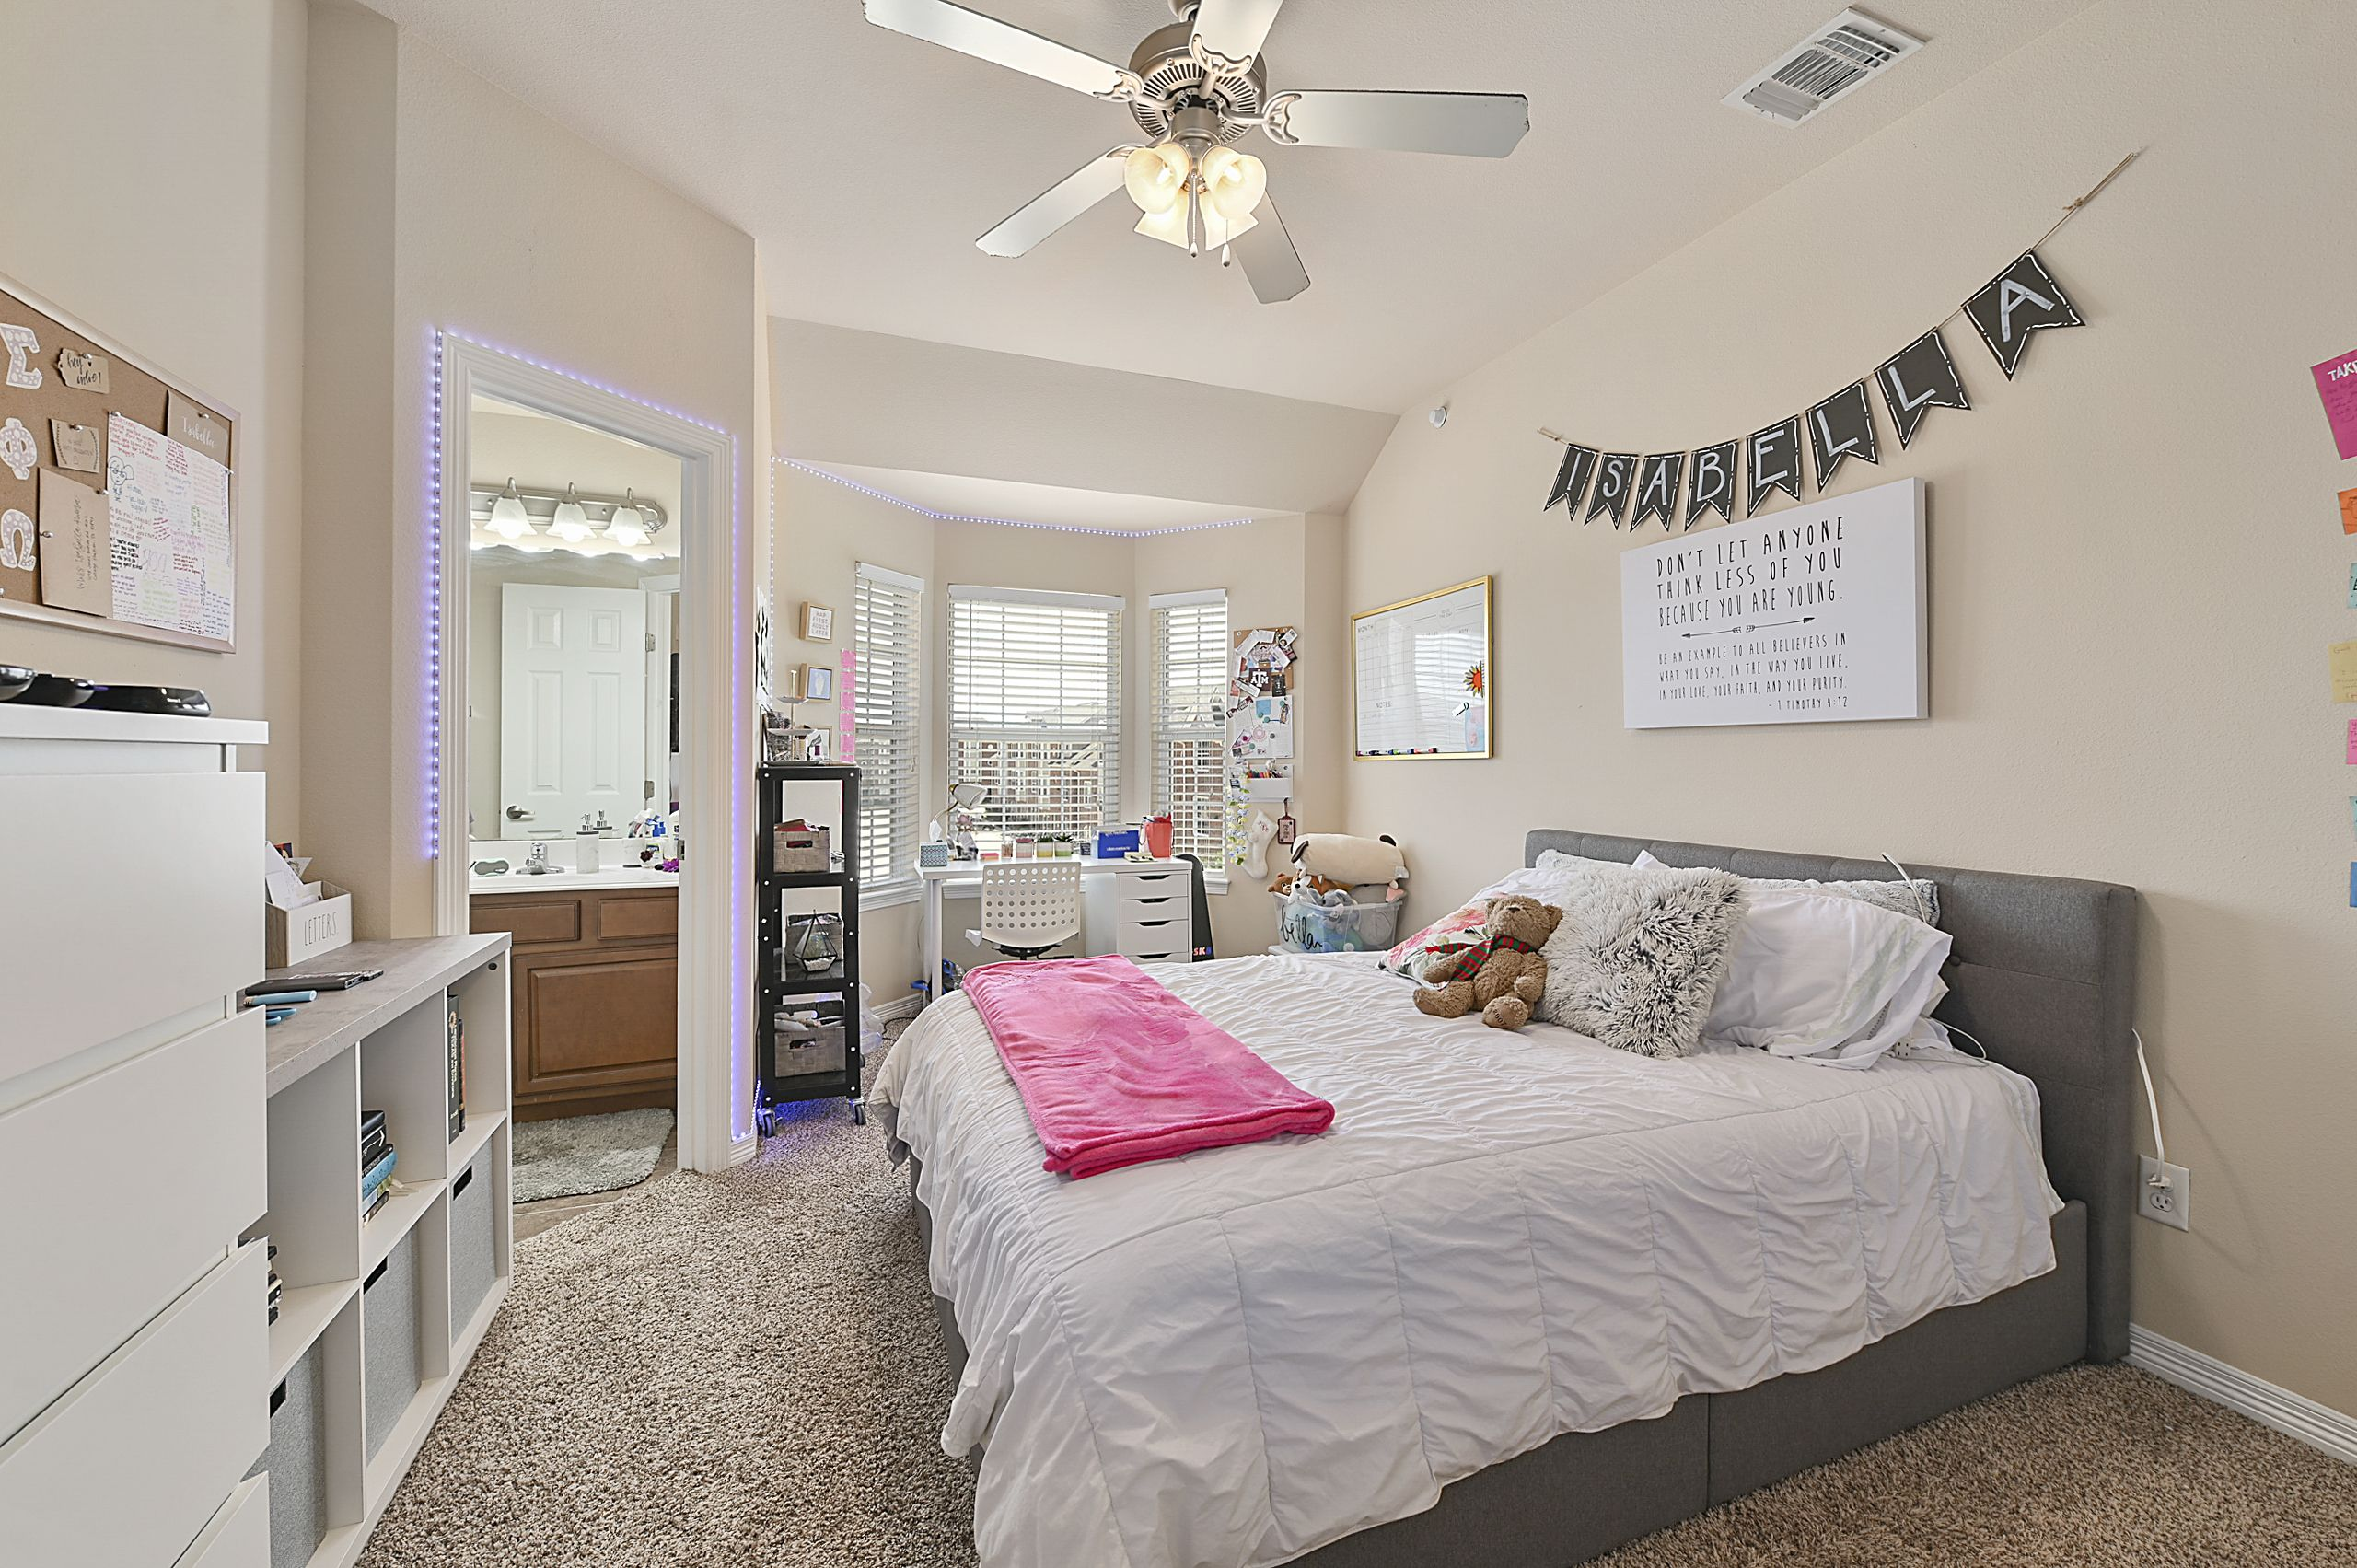 1198 Jones Butler Rd Unit 102 College Station Tx 77840 In 2020 Real Estate Houses Home Keller Williams Realty